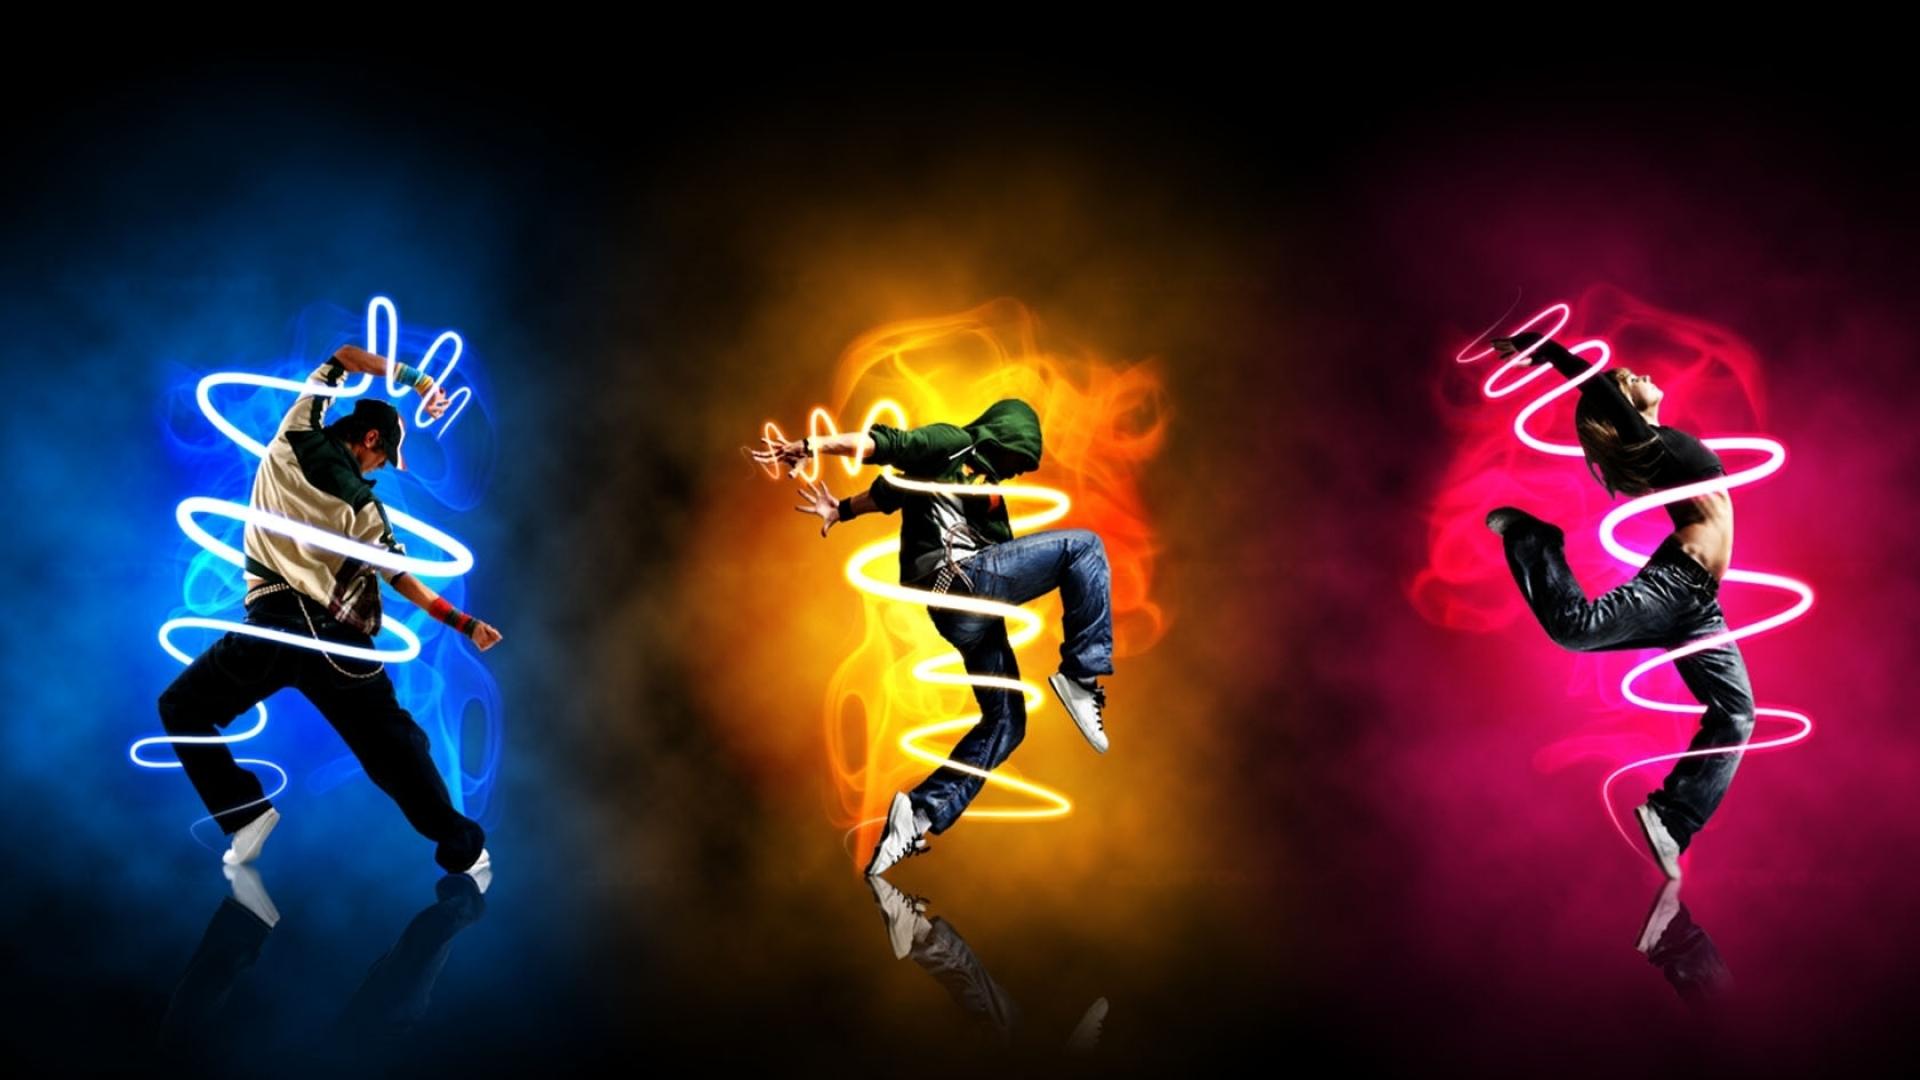 Full HD 1080p Dance Wallpapers HD, Desktop Backgrounds 1920x1080